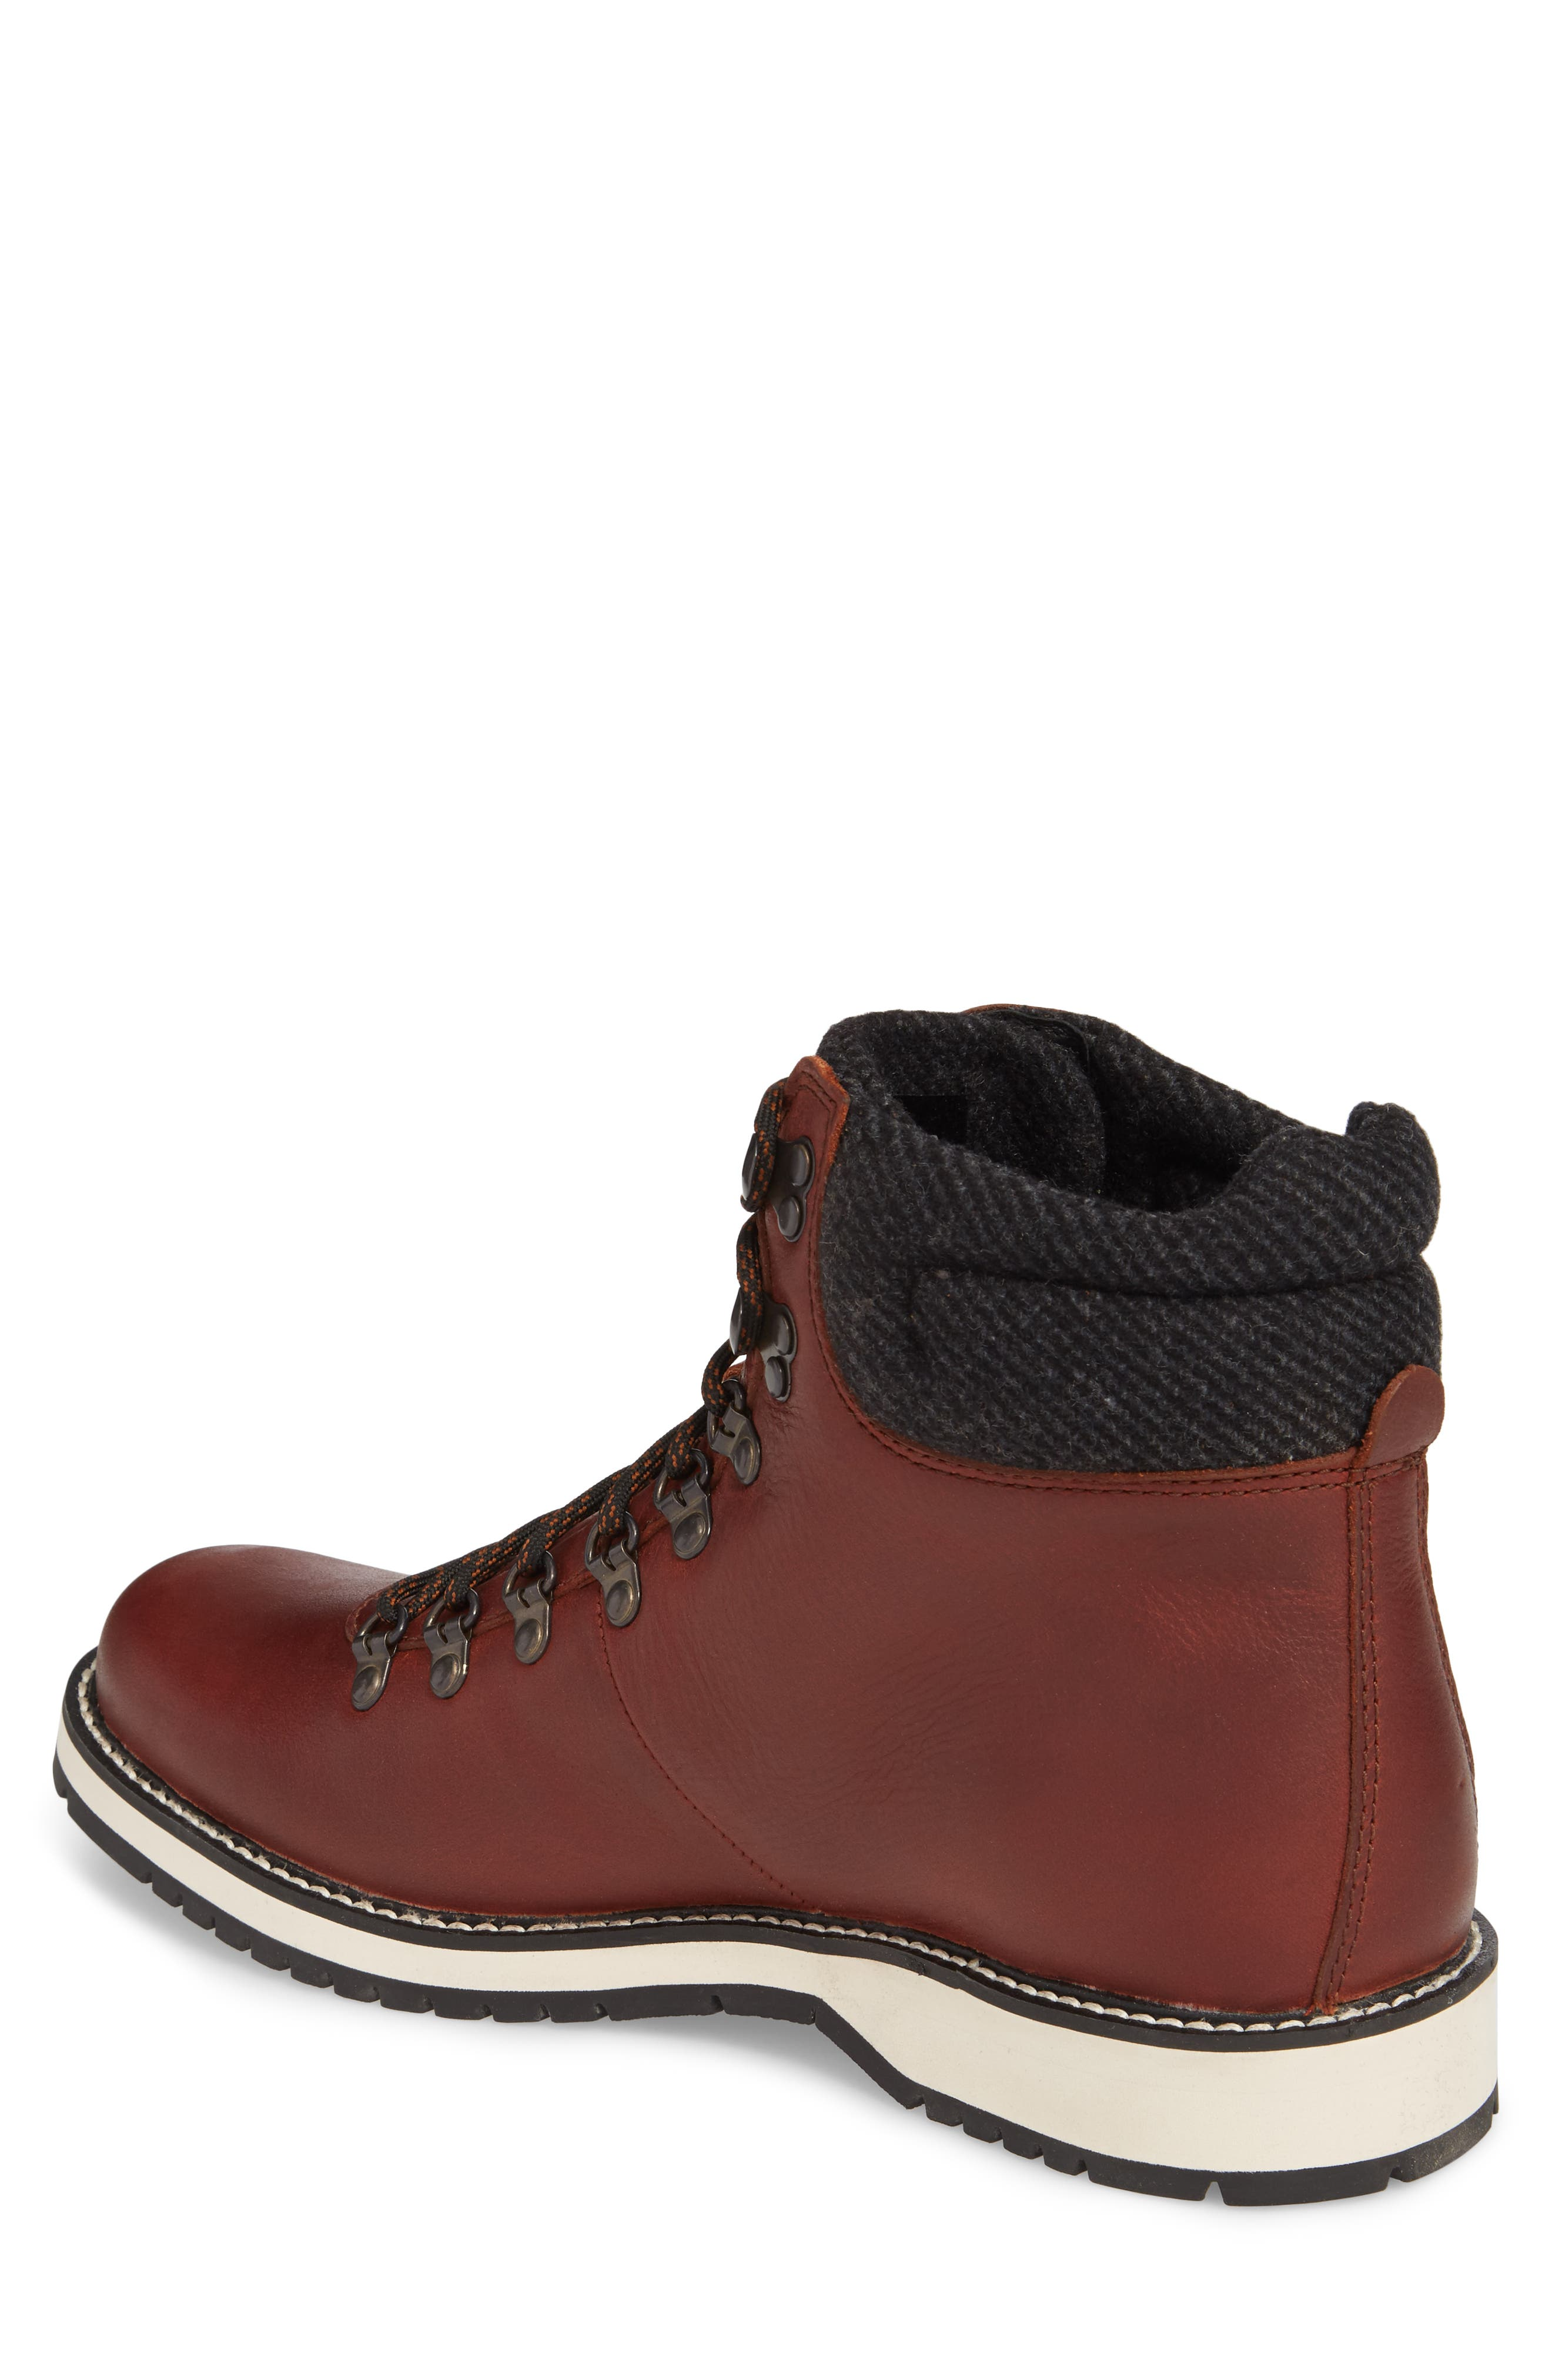 Sidney Waterproof Plain Toe Boot,                             Alternate thumbnail 2, color,                             Brown